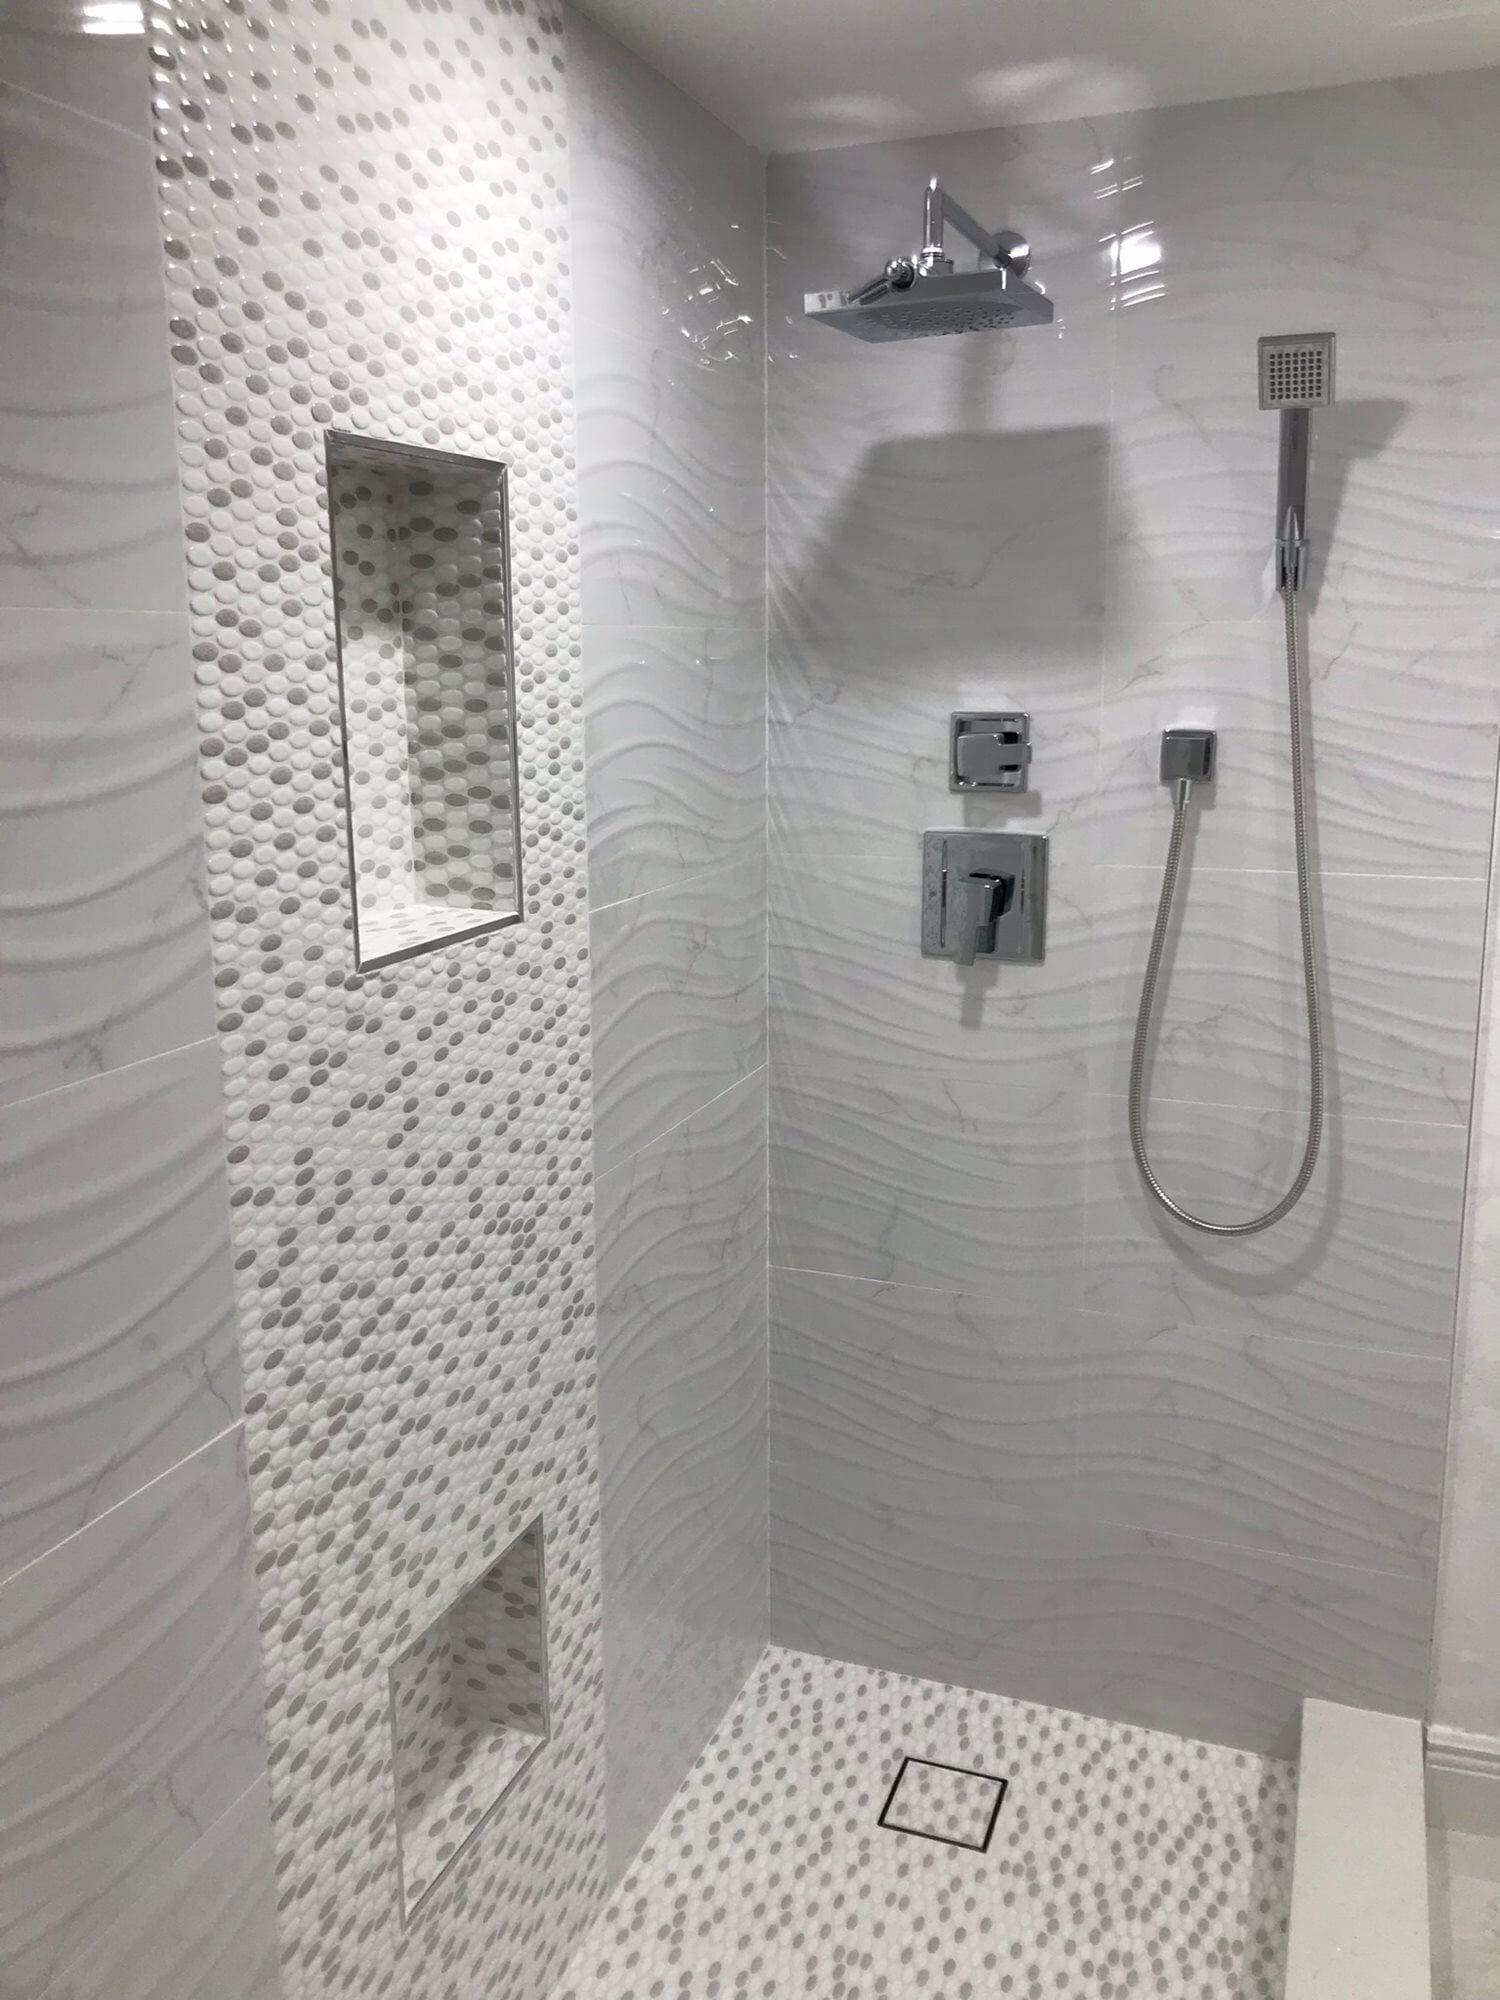 Custom shower design in Boca Roton, FL from Floors For You Kitchen & Bath